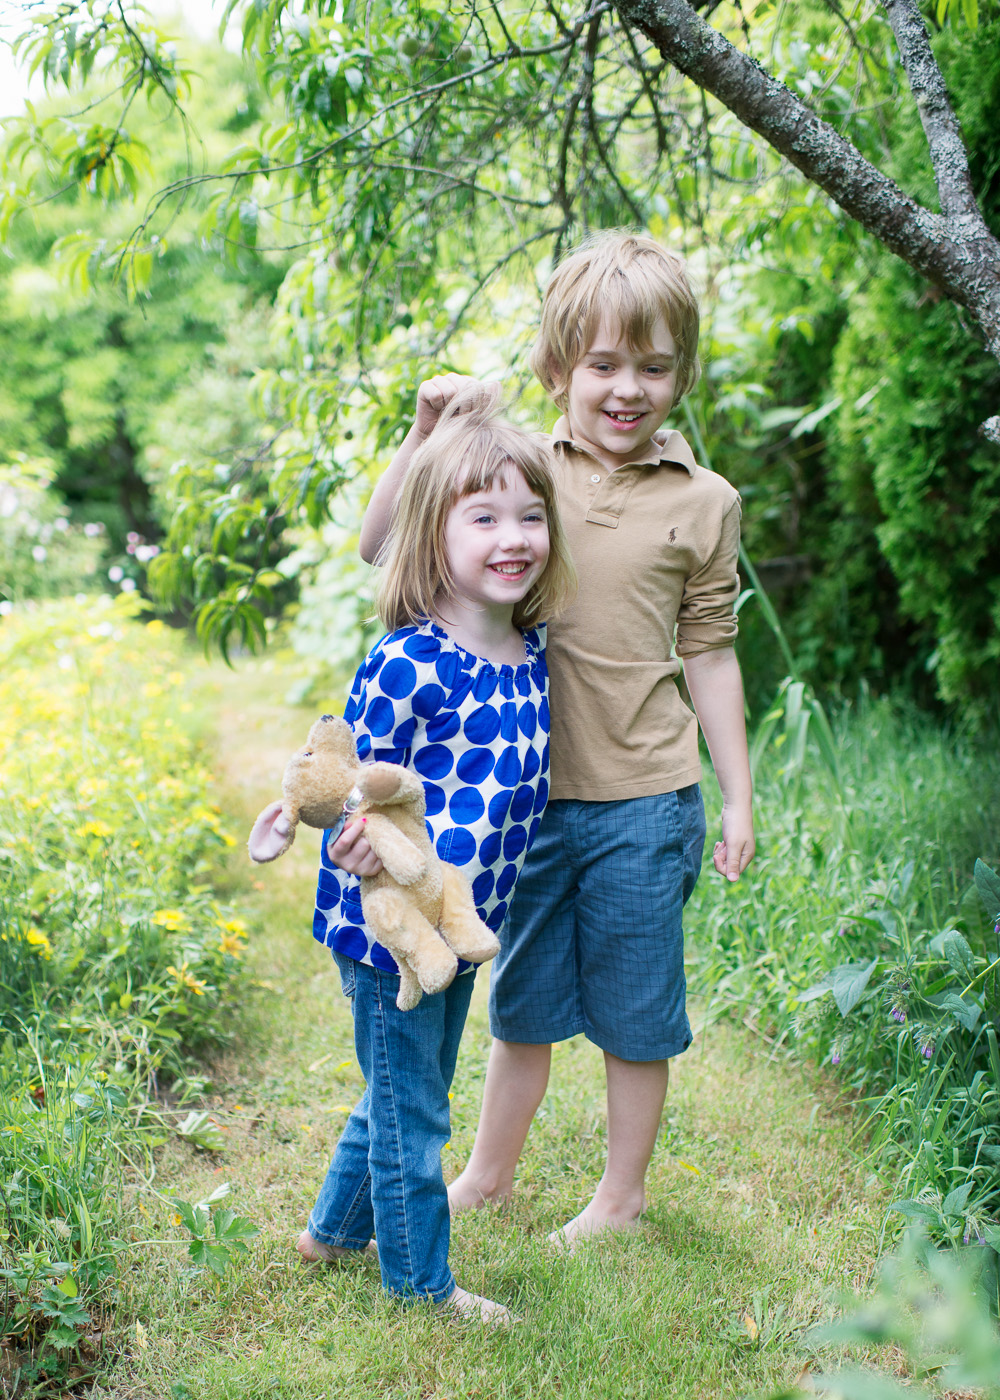 clyde-hill-family-photographer23.jpg